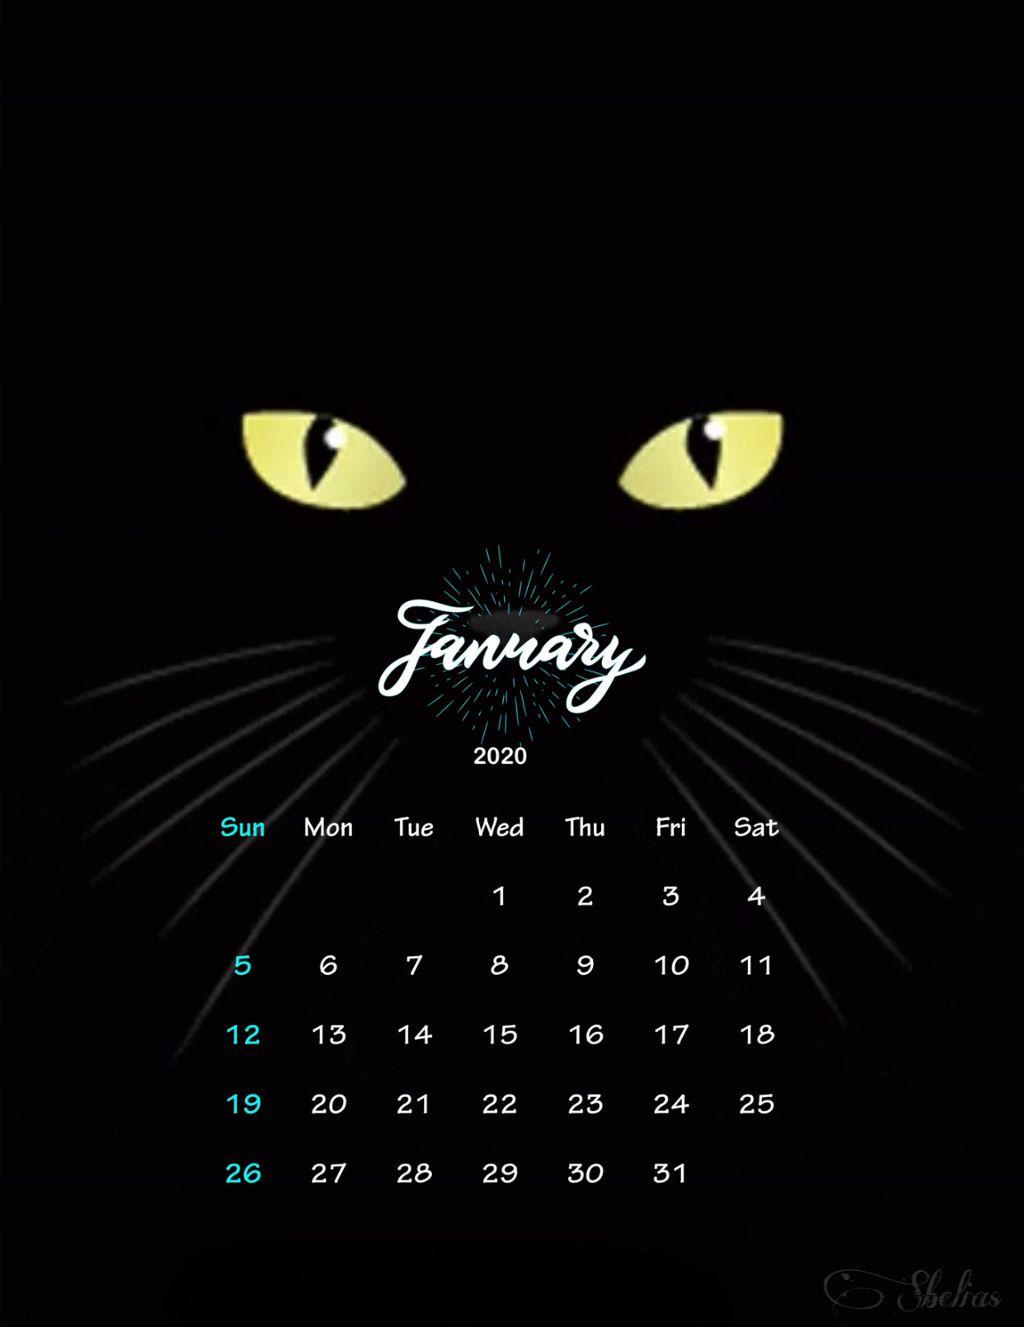 https://picsart.com/i/316062917051201?challenge_id=5e09cd497ea39737aff99d1f  #freetoedit #calendar #january #anonovo #newyear #srcjanuarycalendar #januarycalendar